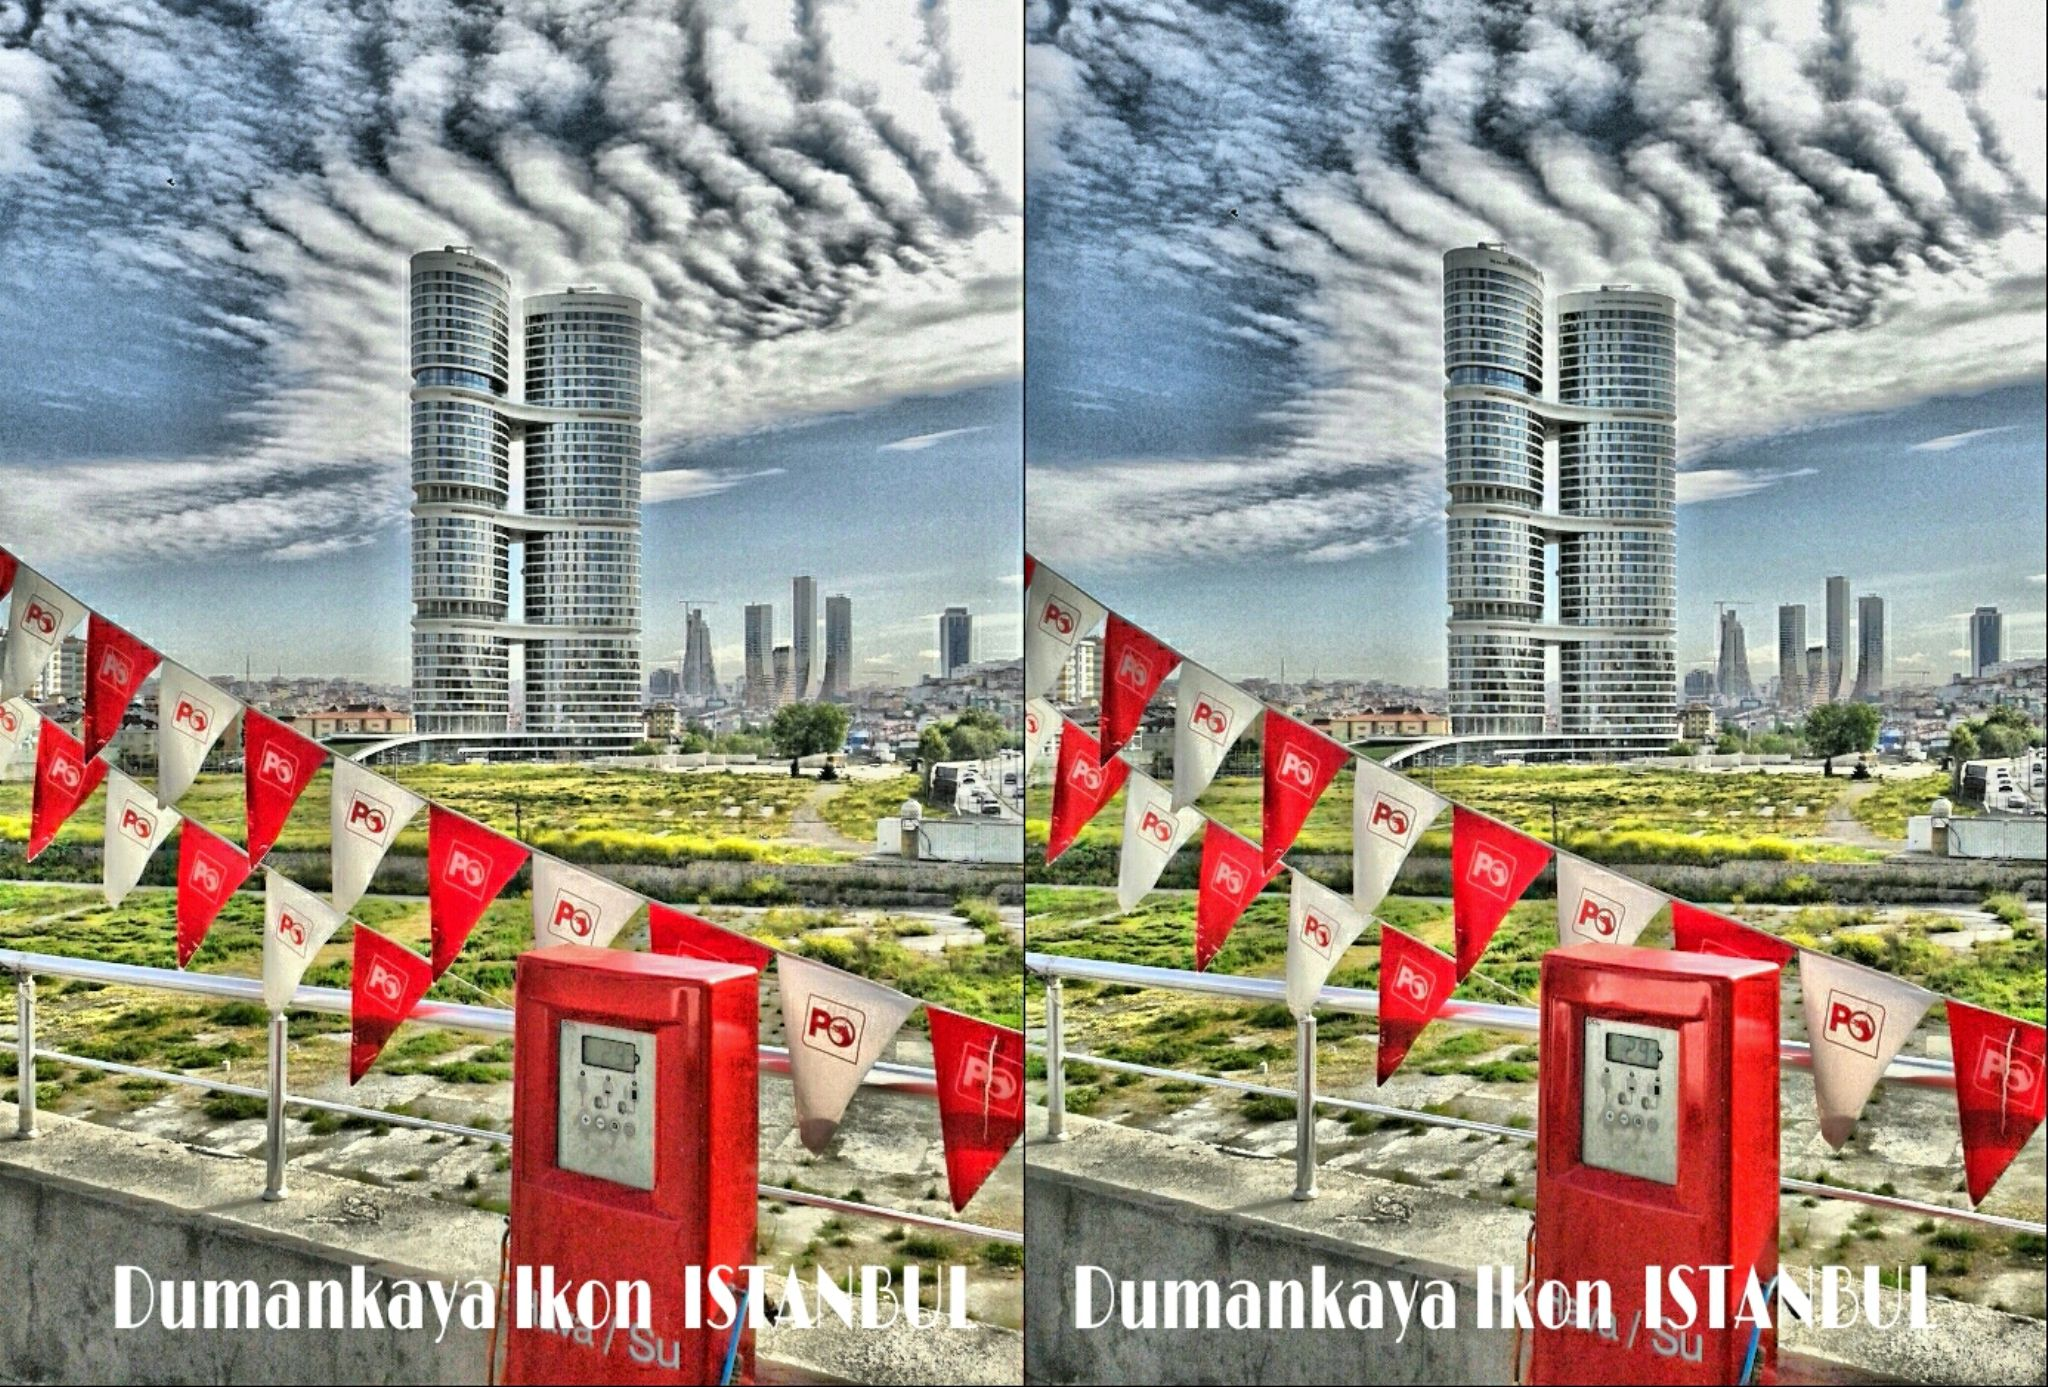 DUMANKAYA IKON - ATASEHIR - ASIAN SIDE OF ISTANBUL by Istanbul 3D Photography